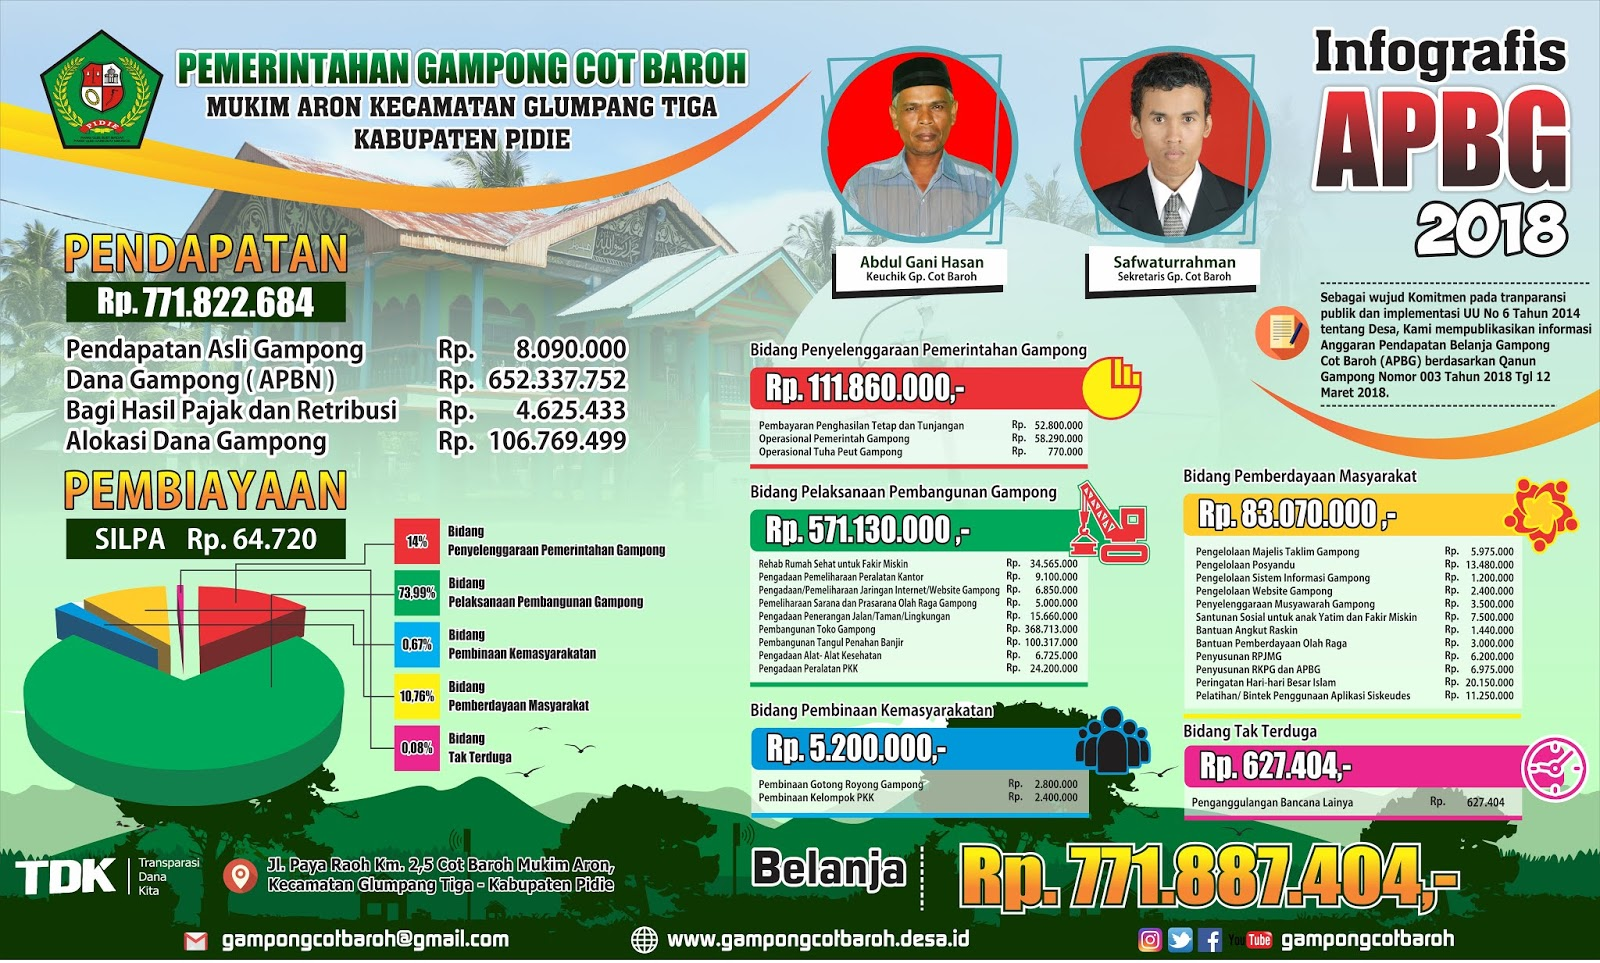 Infografis APBG Cot Baroh Versi Landscape + Rincian